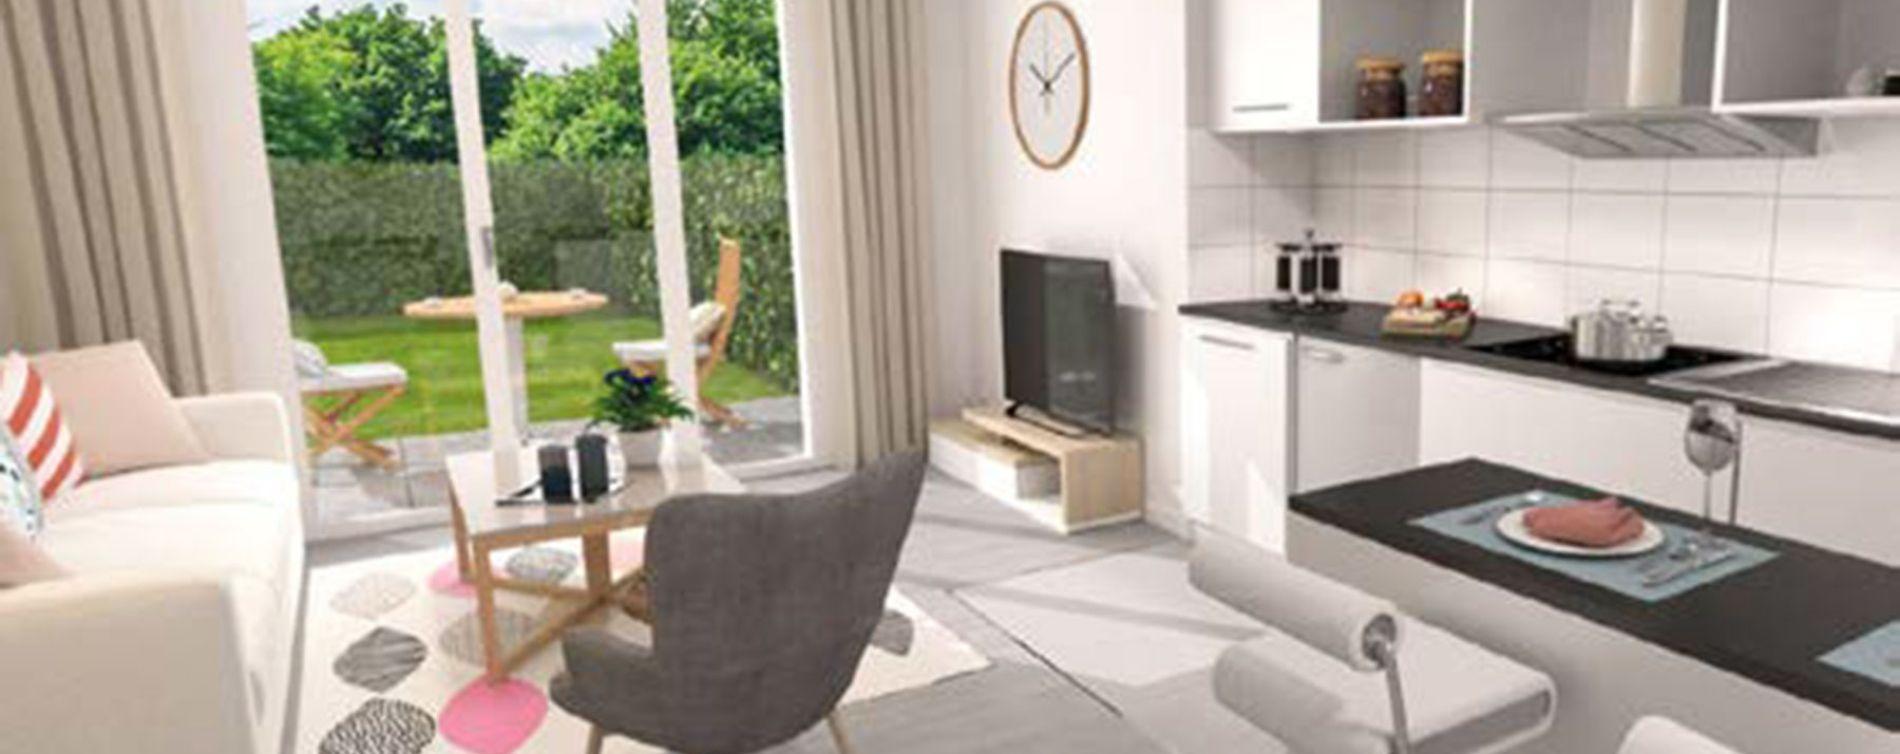 Chevry-Cossigny : programme immobilier neuve « Le Domaine des Arts » (3)